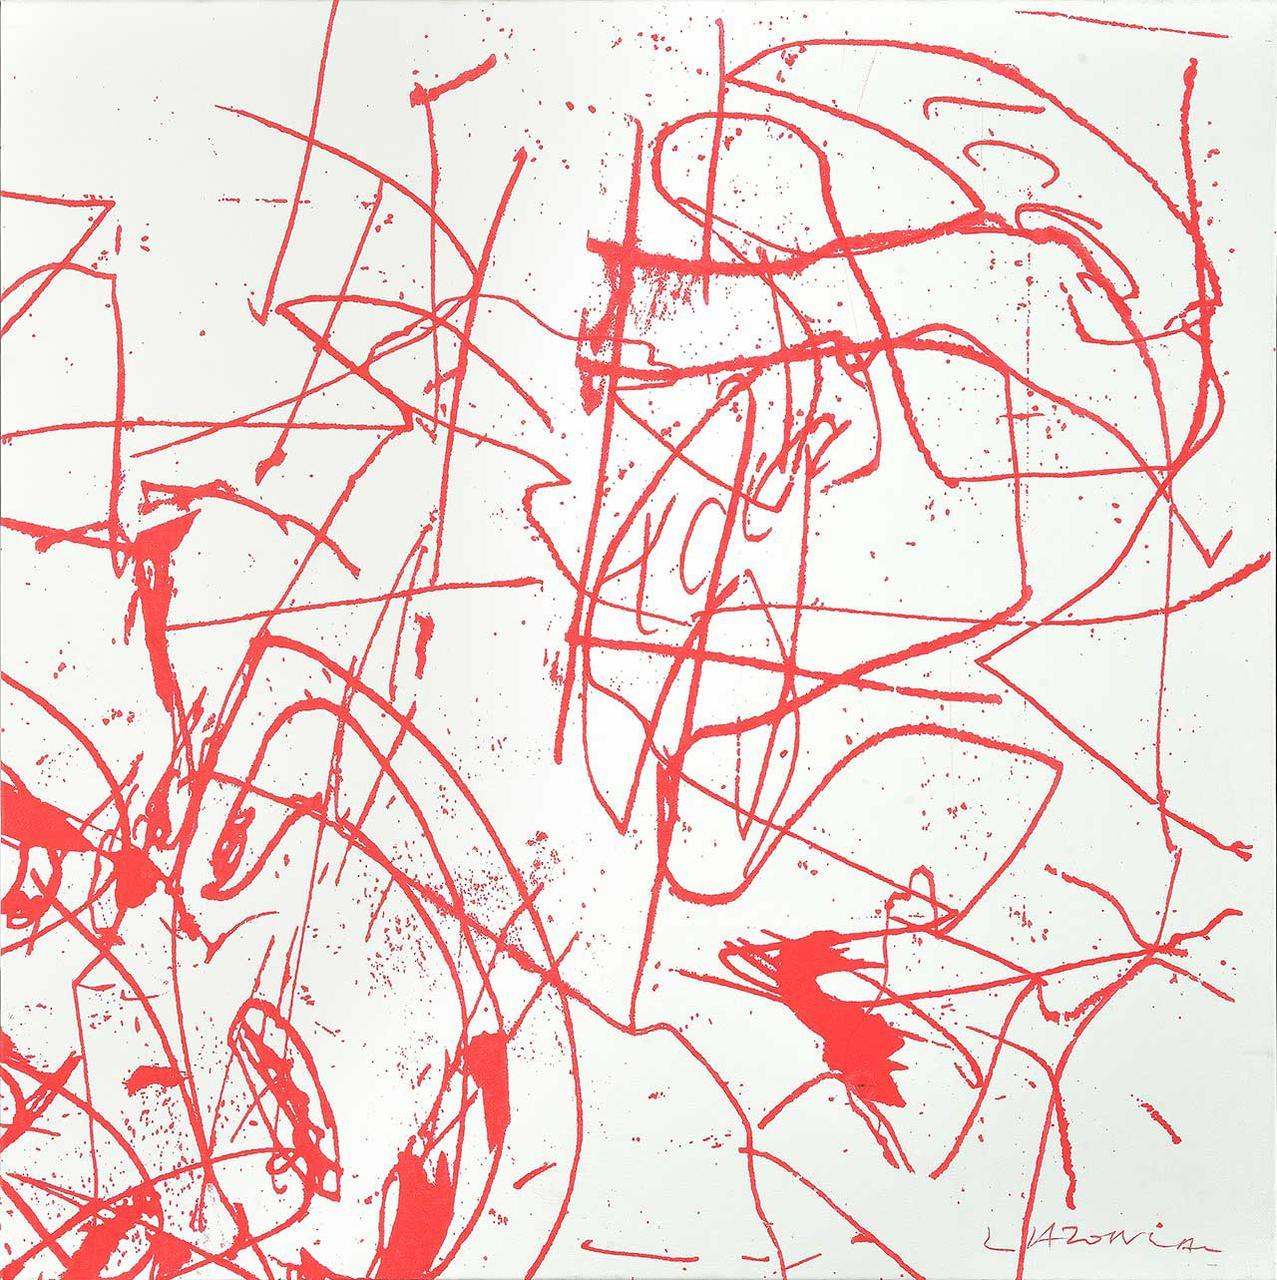 Big Bang, 1992, μεταξοτυπικό λάδι σε καμβά, 70x70 εκ.